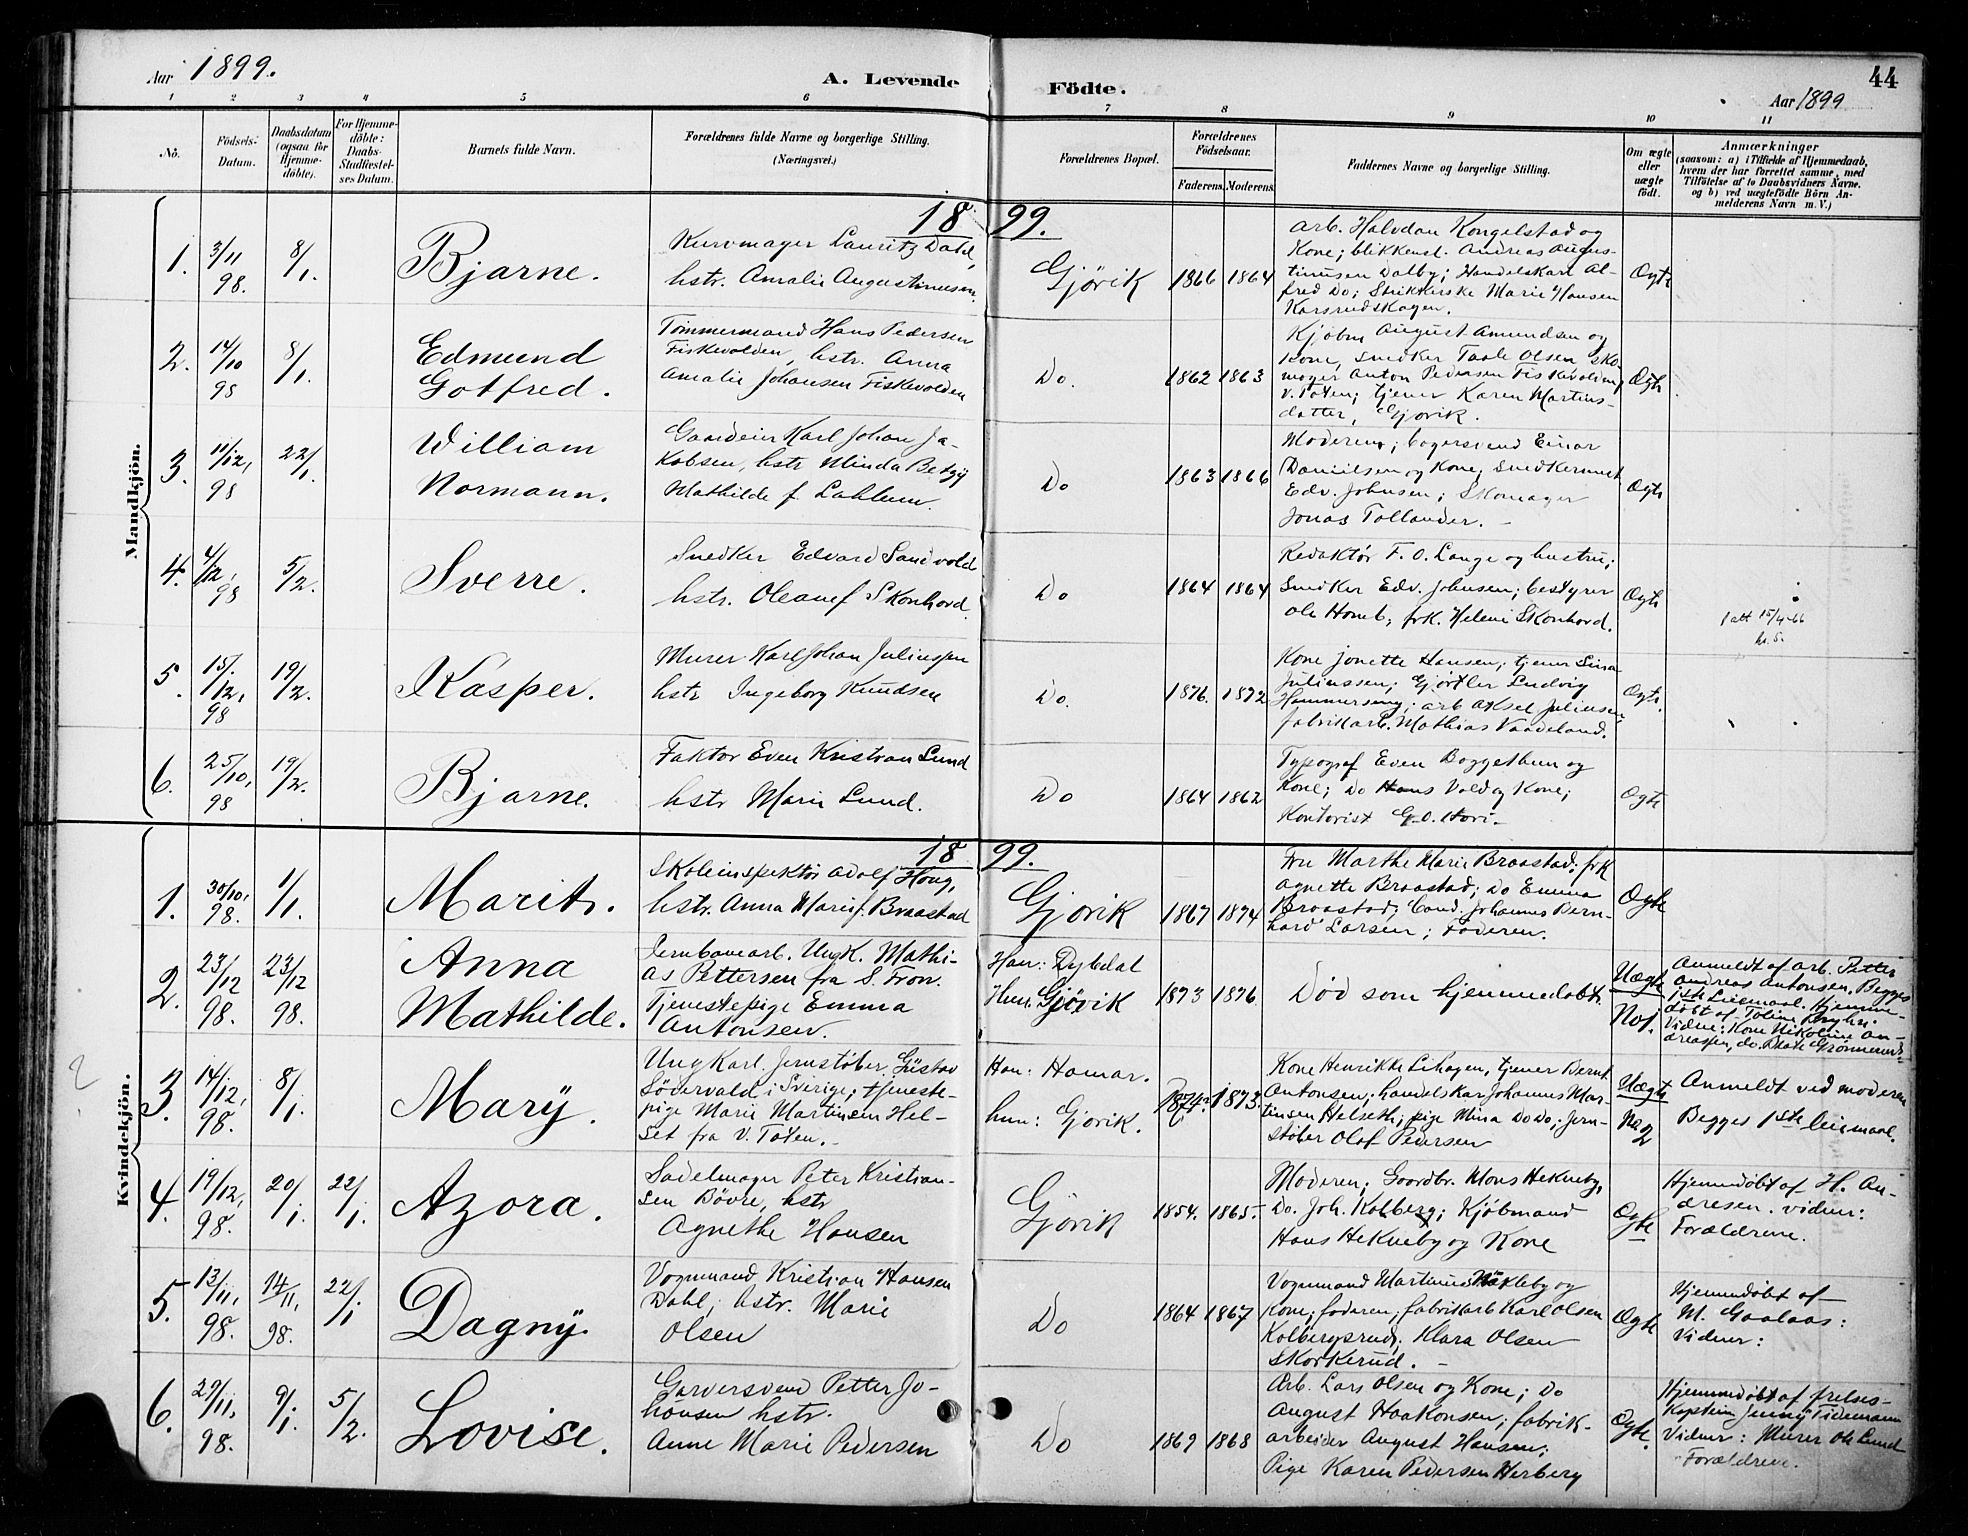 SAH, Vardal prestekontor, H/Ha/Haa/L0011: Ministerialbok nr. 11, 1891-1901, s. 44